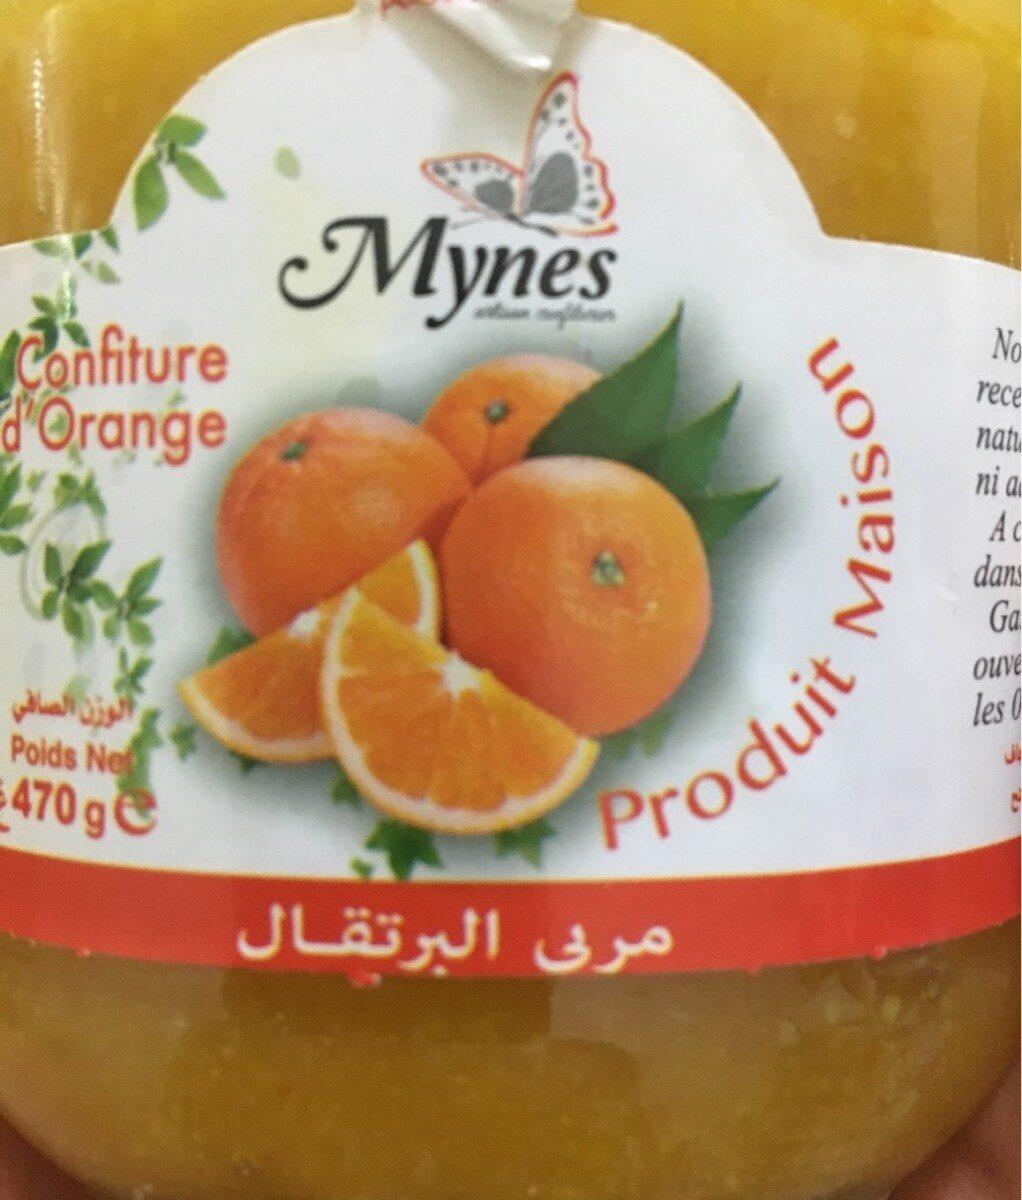 Confiture d'orange - Product - fr